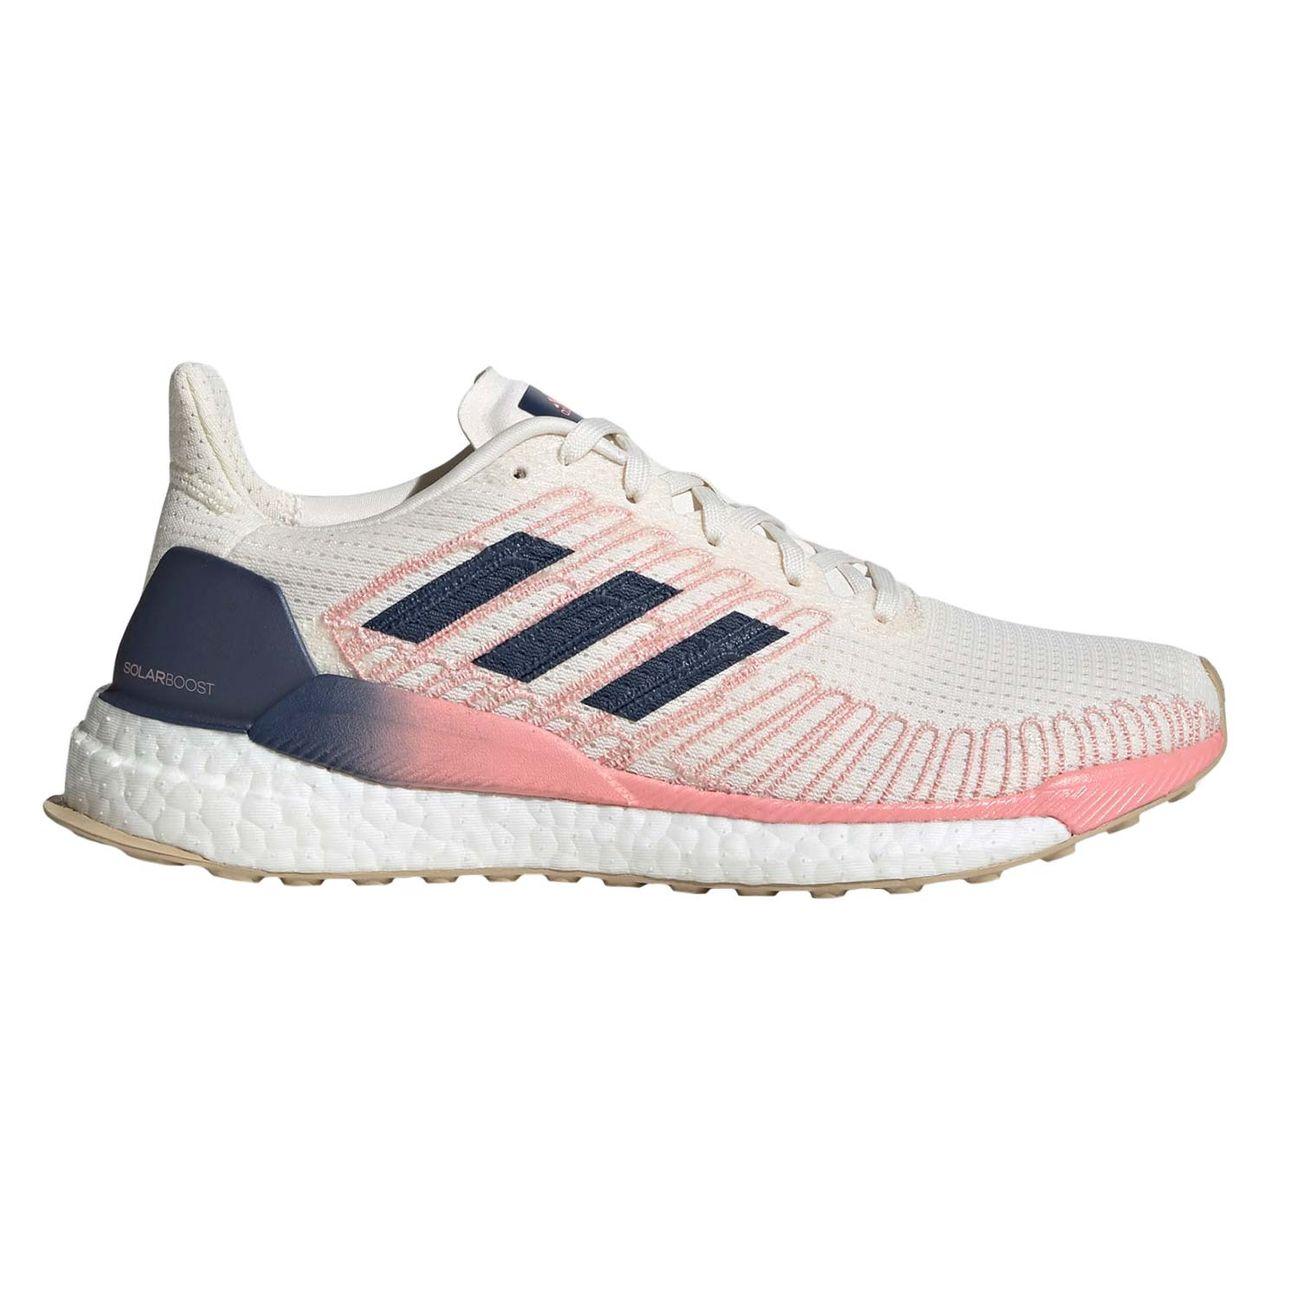 Course à pied femme ADIDAS PERFORMANCE Chaussures de running adidas Performance Solar Boost 19 W